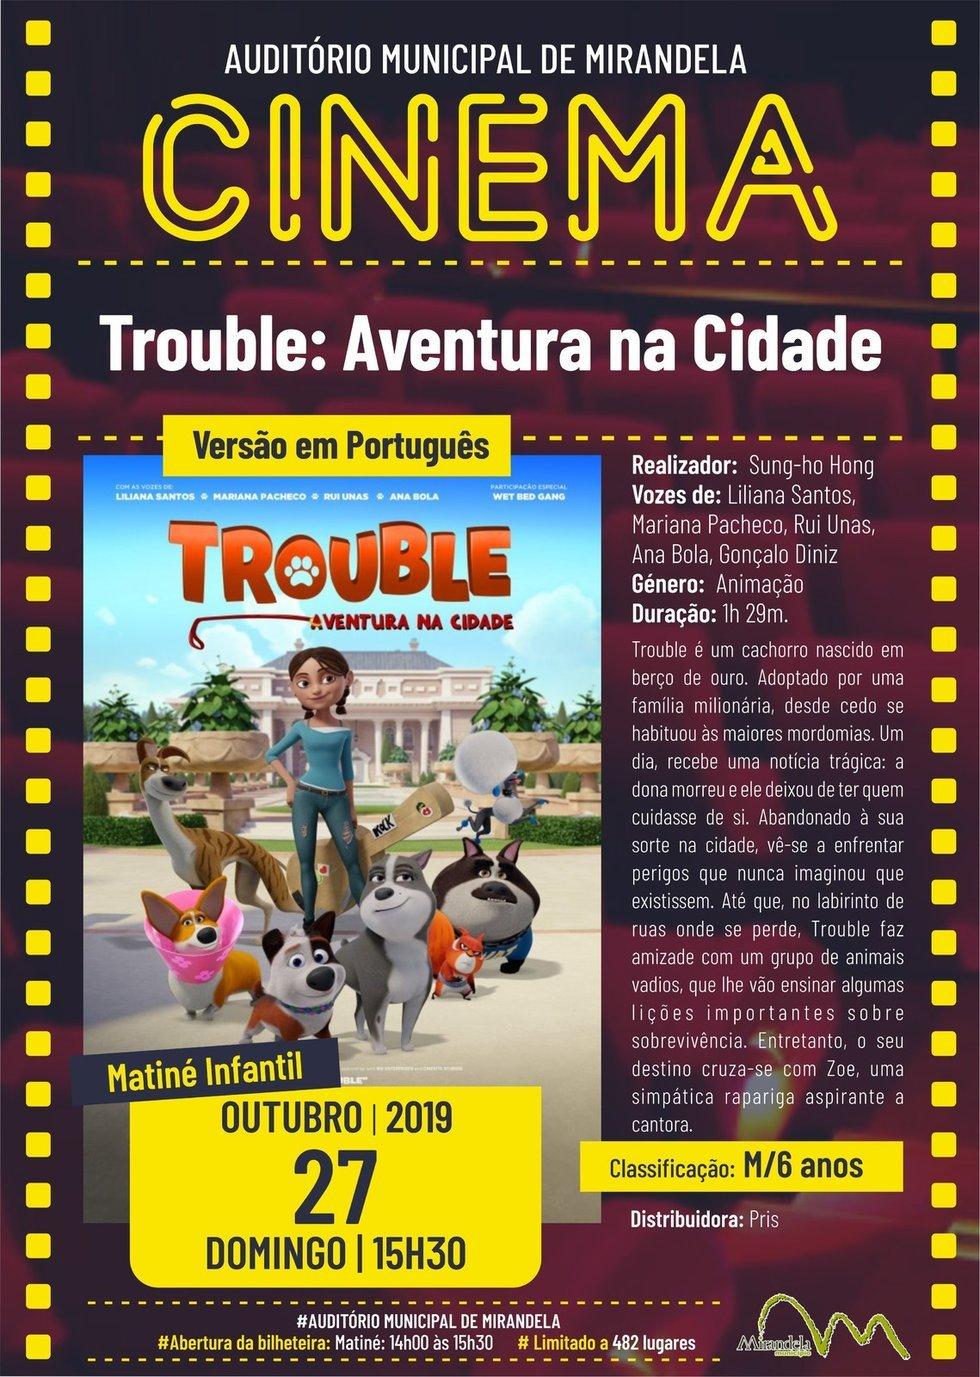 Cinema: Trouble - Aventura na Cidade